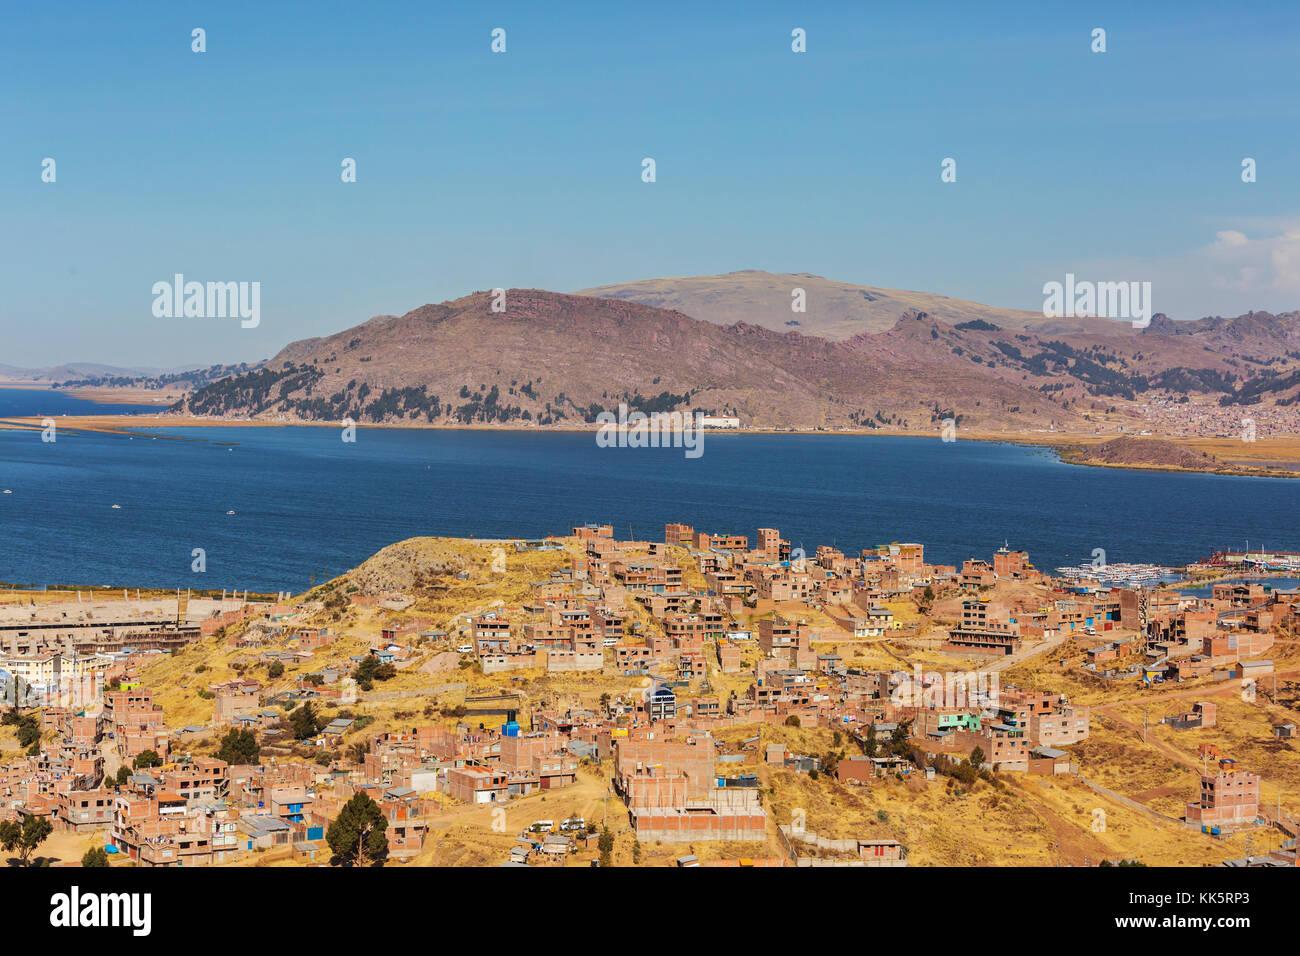 Titikaka lake in Peru, South America - Stock Image